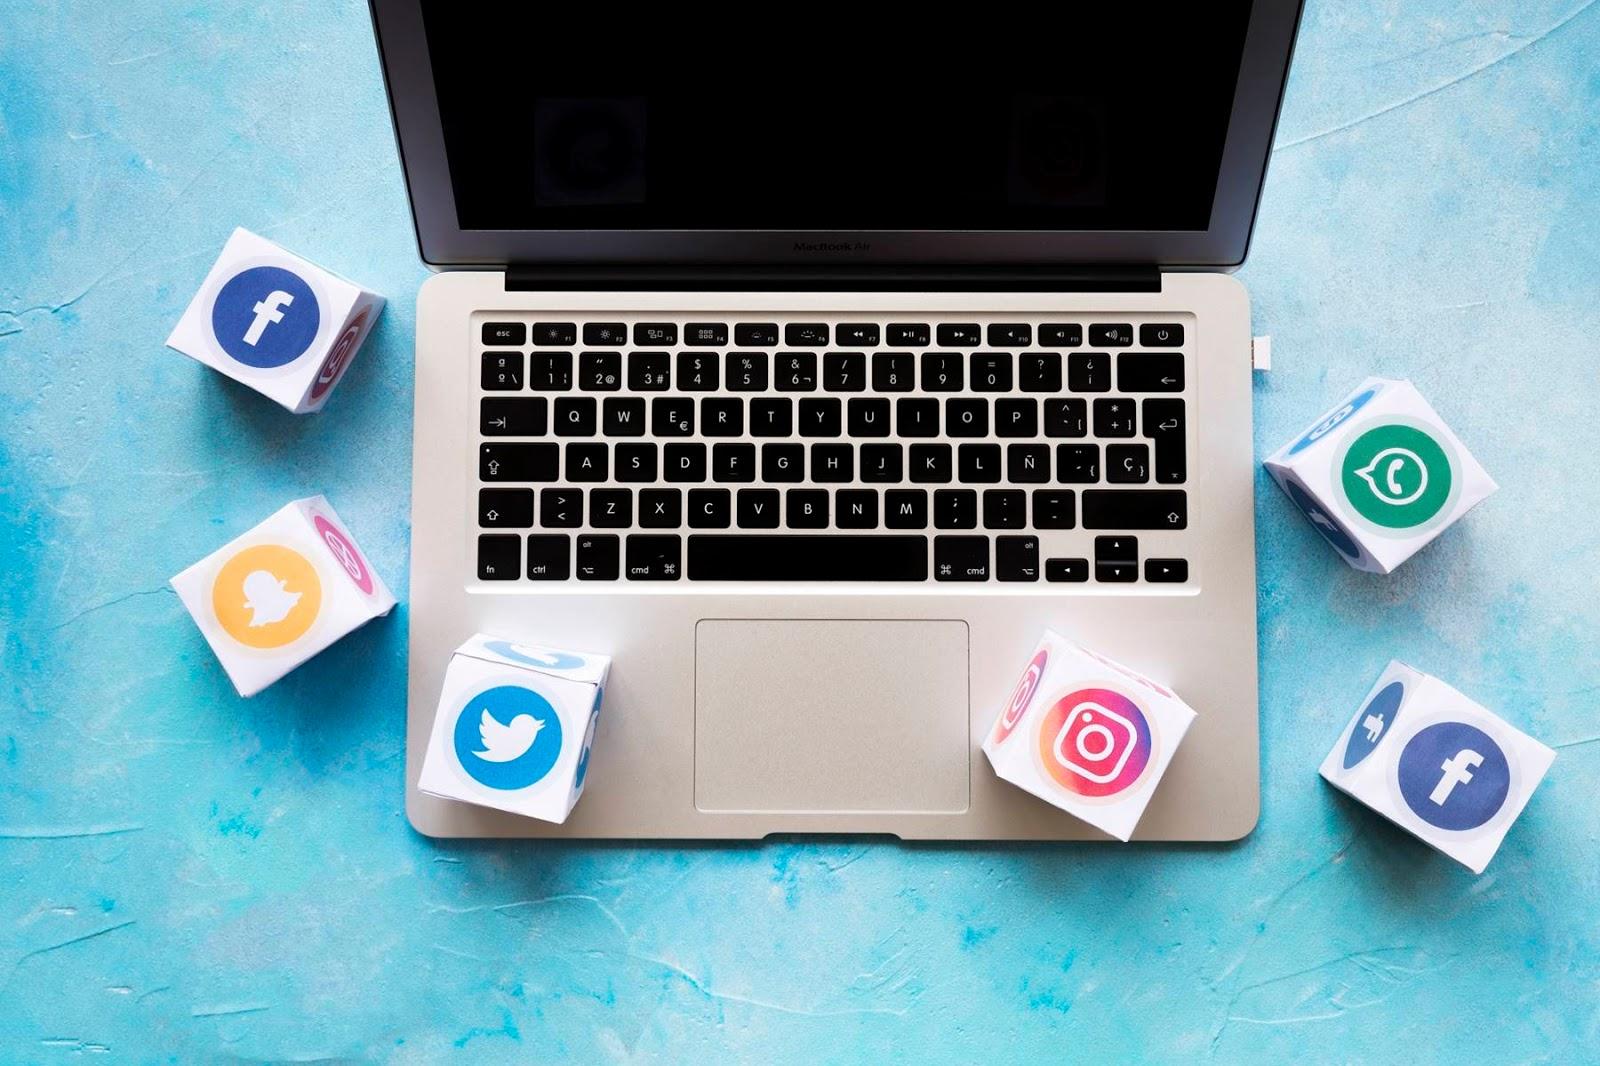 Best social media for business, best social media platforms for marketing, social media for your business